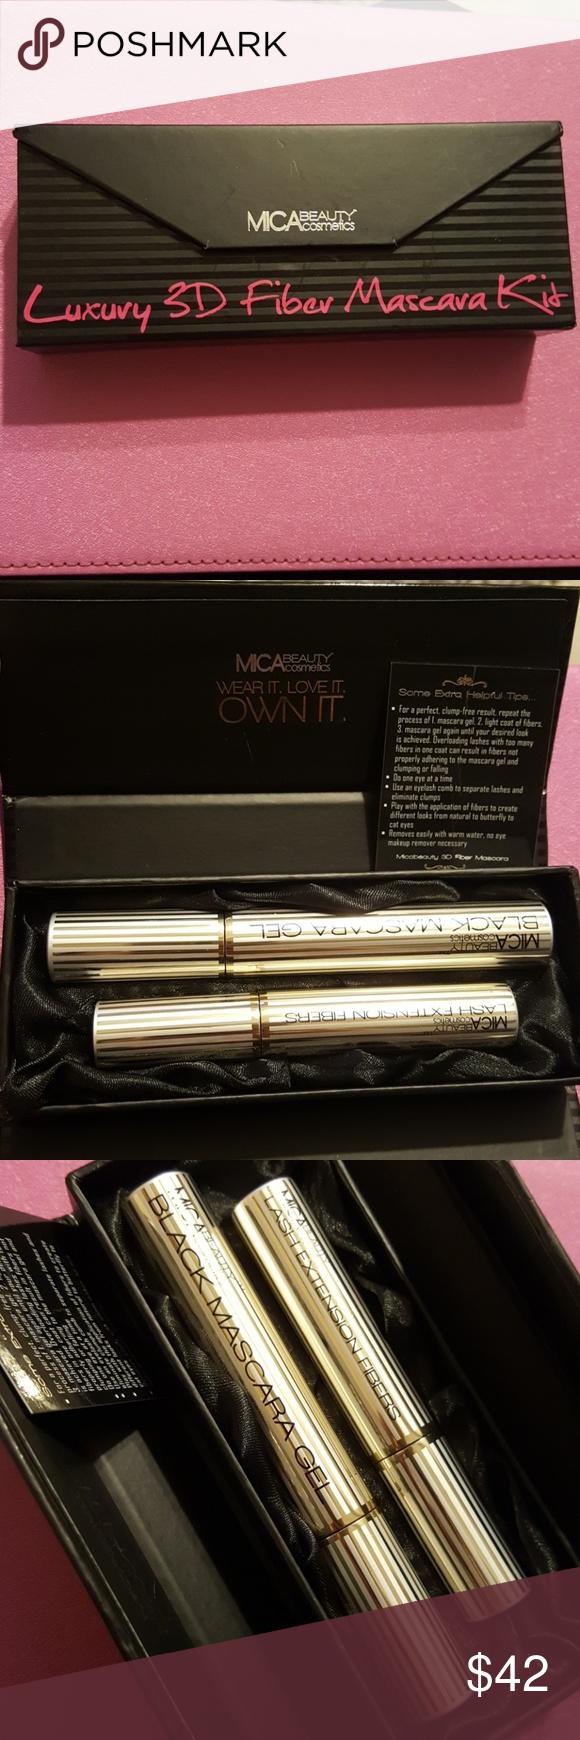 Luxury 3D Fiber Mascara Kit Mica Beauty cosmetics luxury